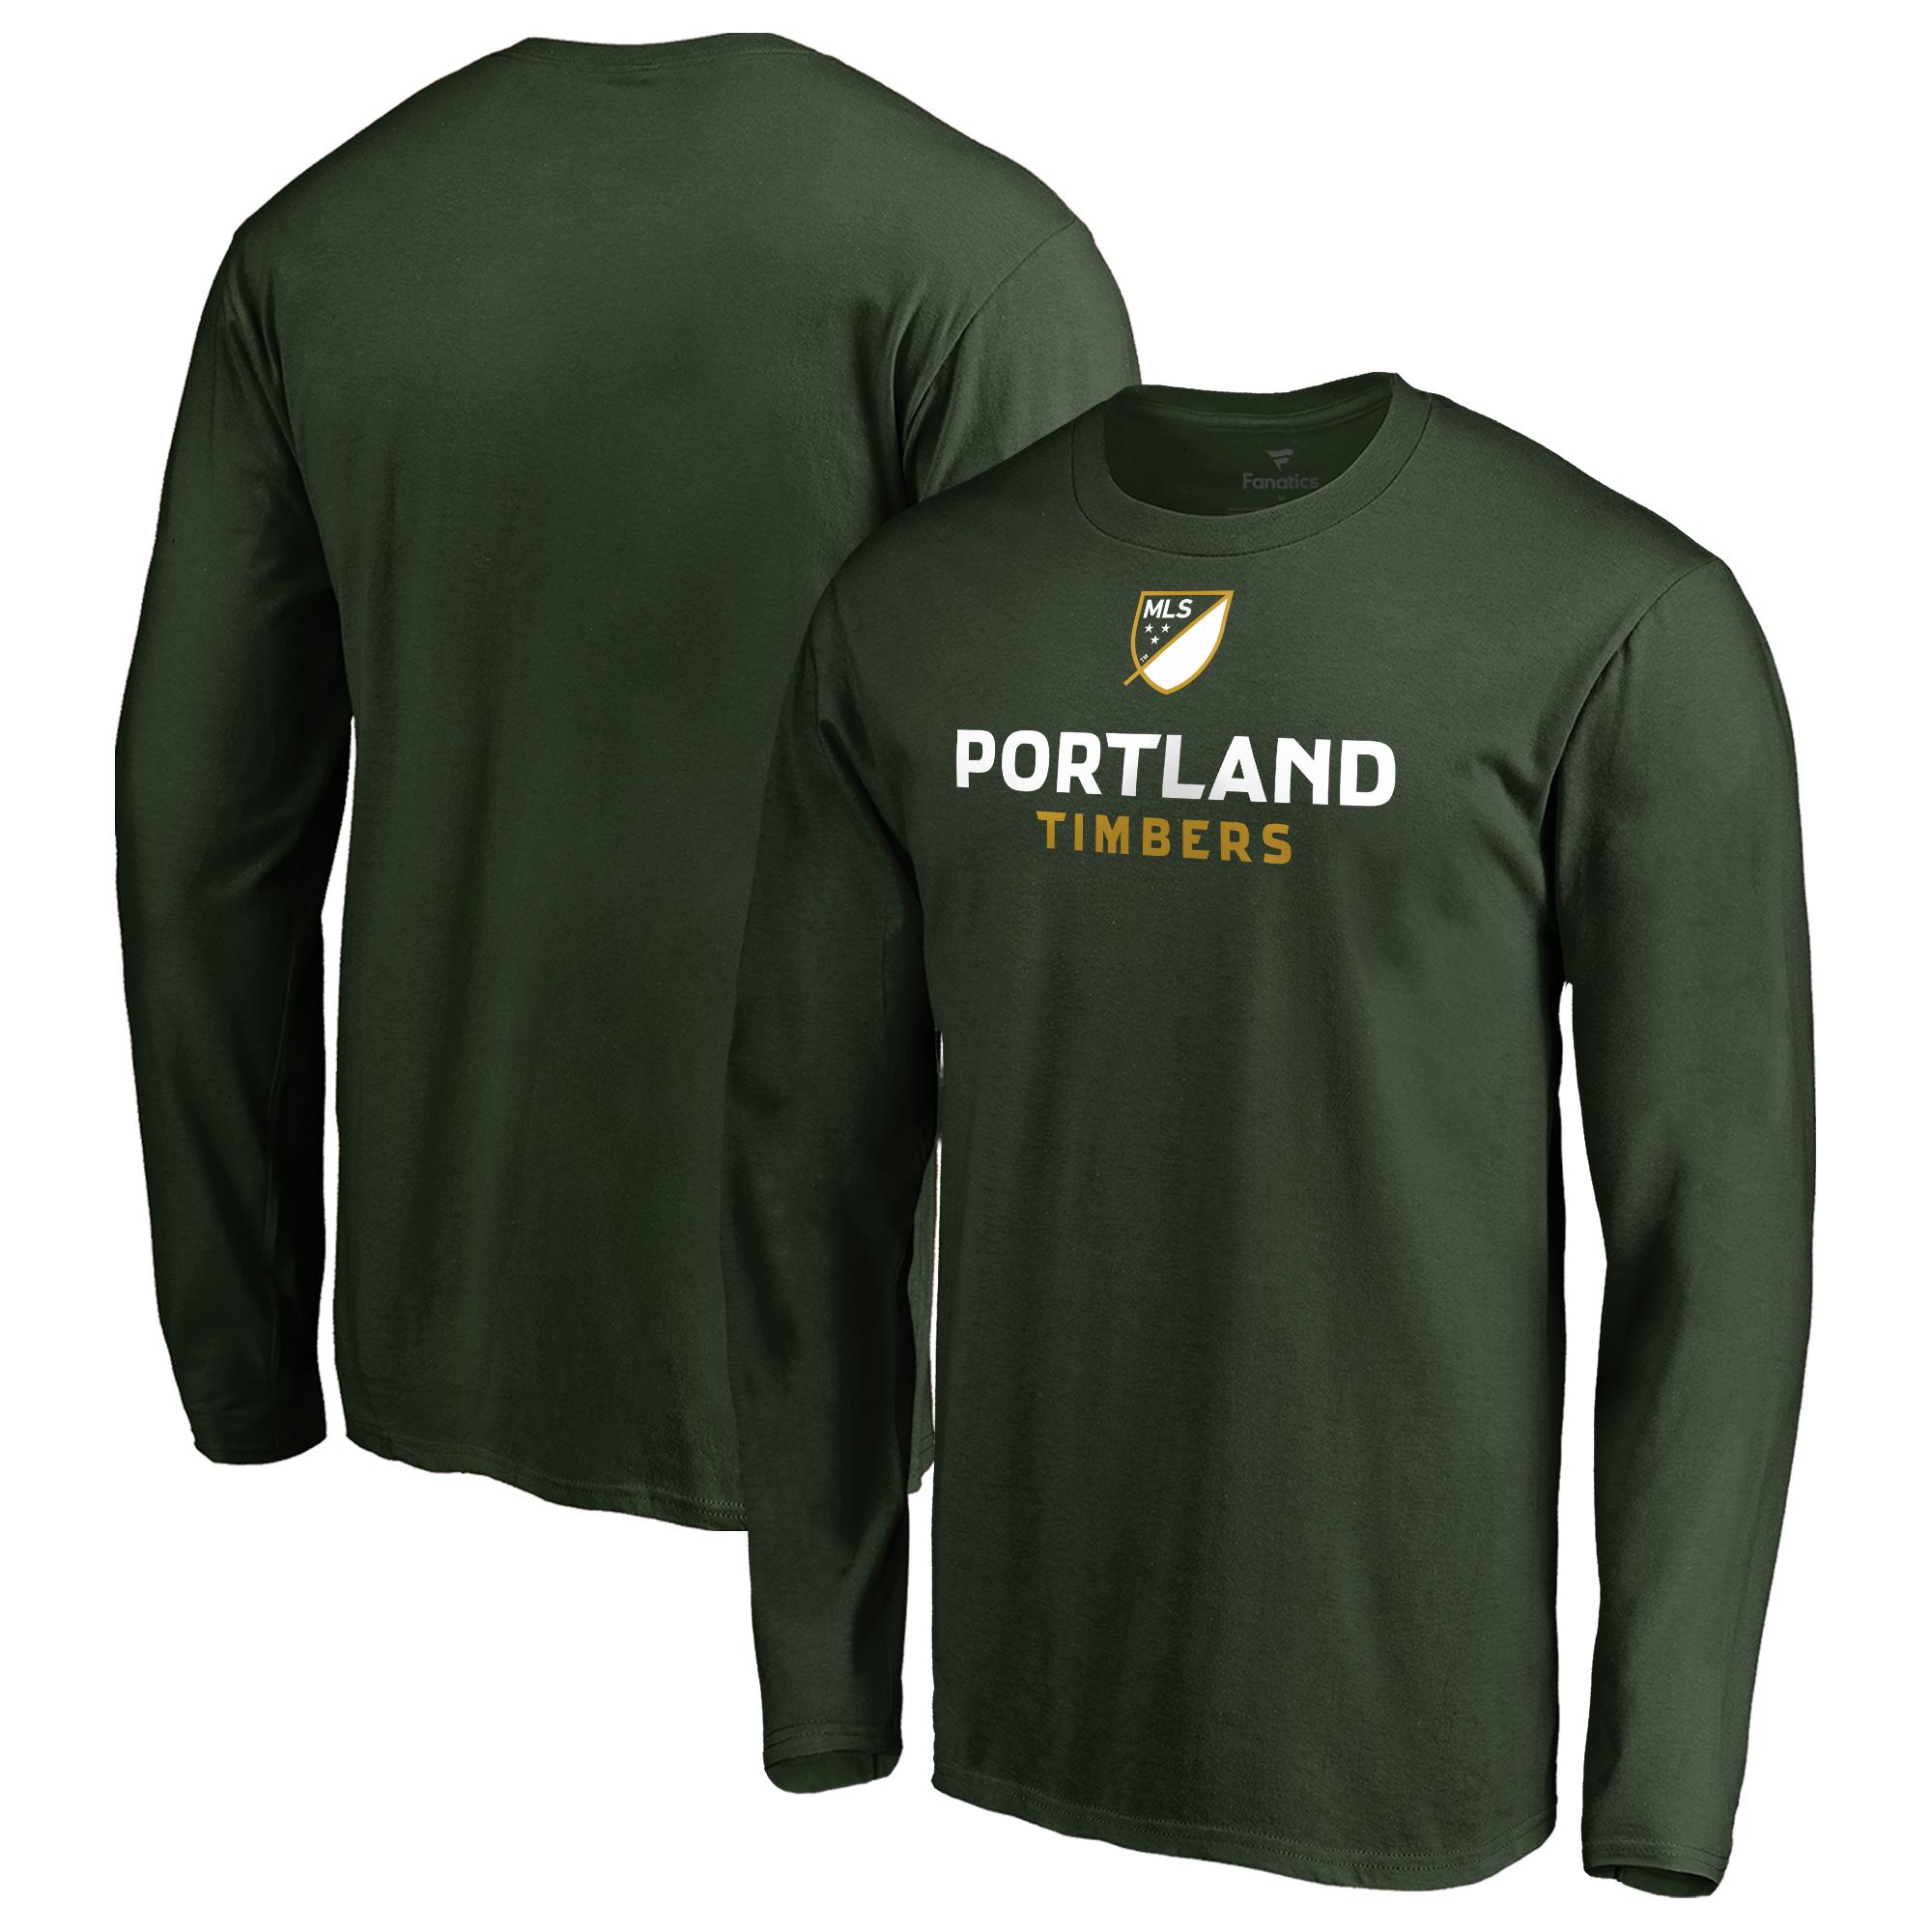 Portland Timbers Fanatics Branded Shielded Long Sleeve T-Shirt - Green